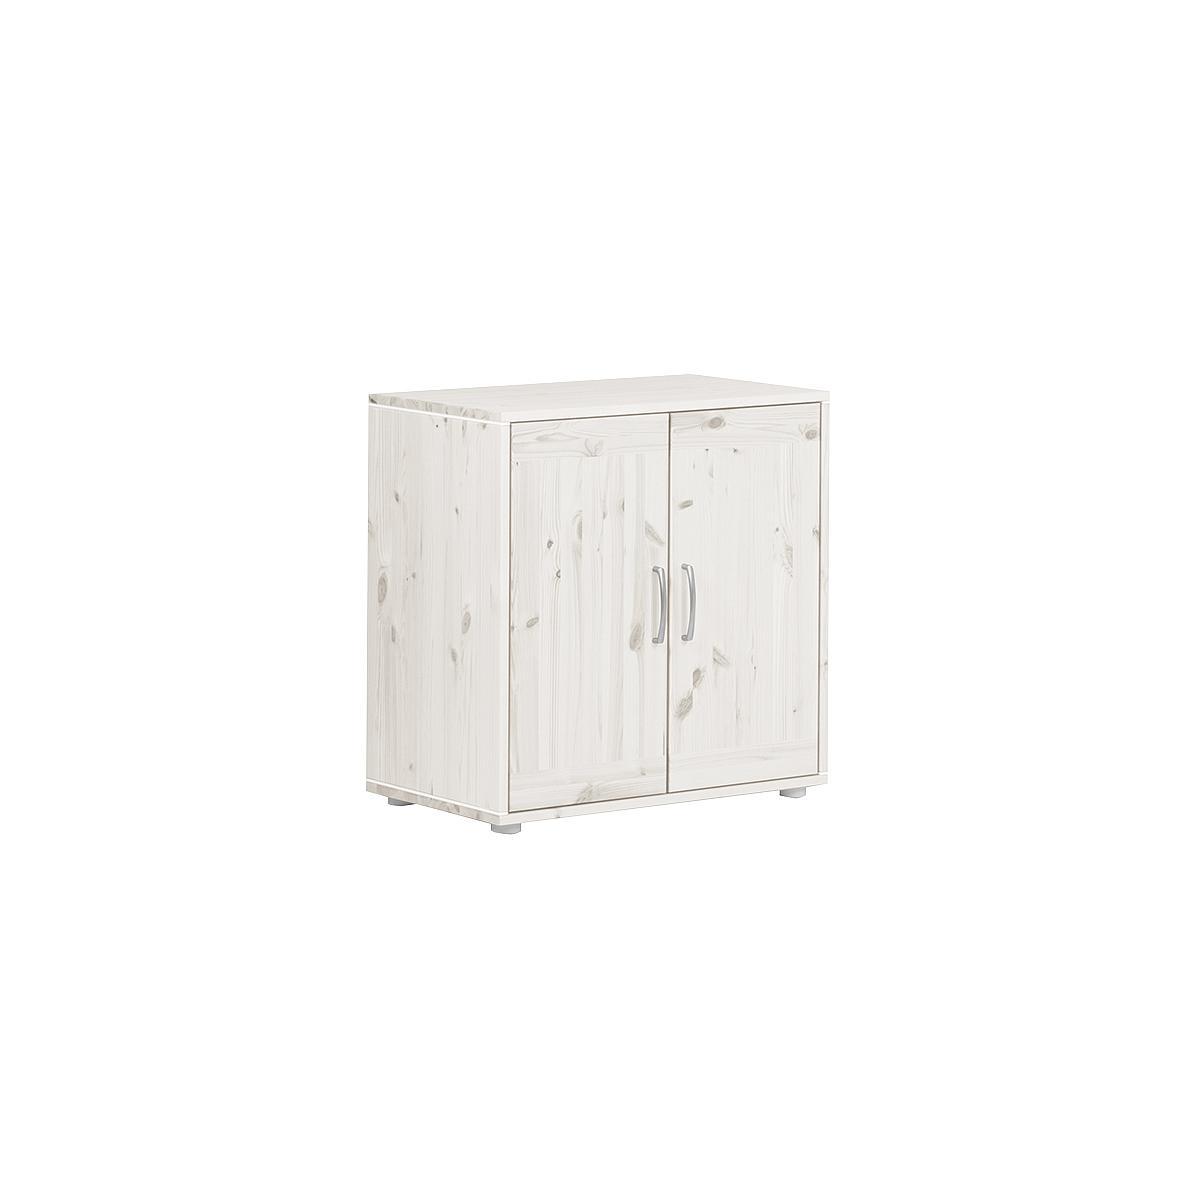 Armario infantil 2 puertas 1 estante NEW CLASSIC Flexa blanco cal - blanco cal - blanco